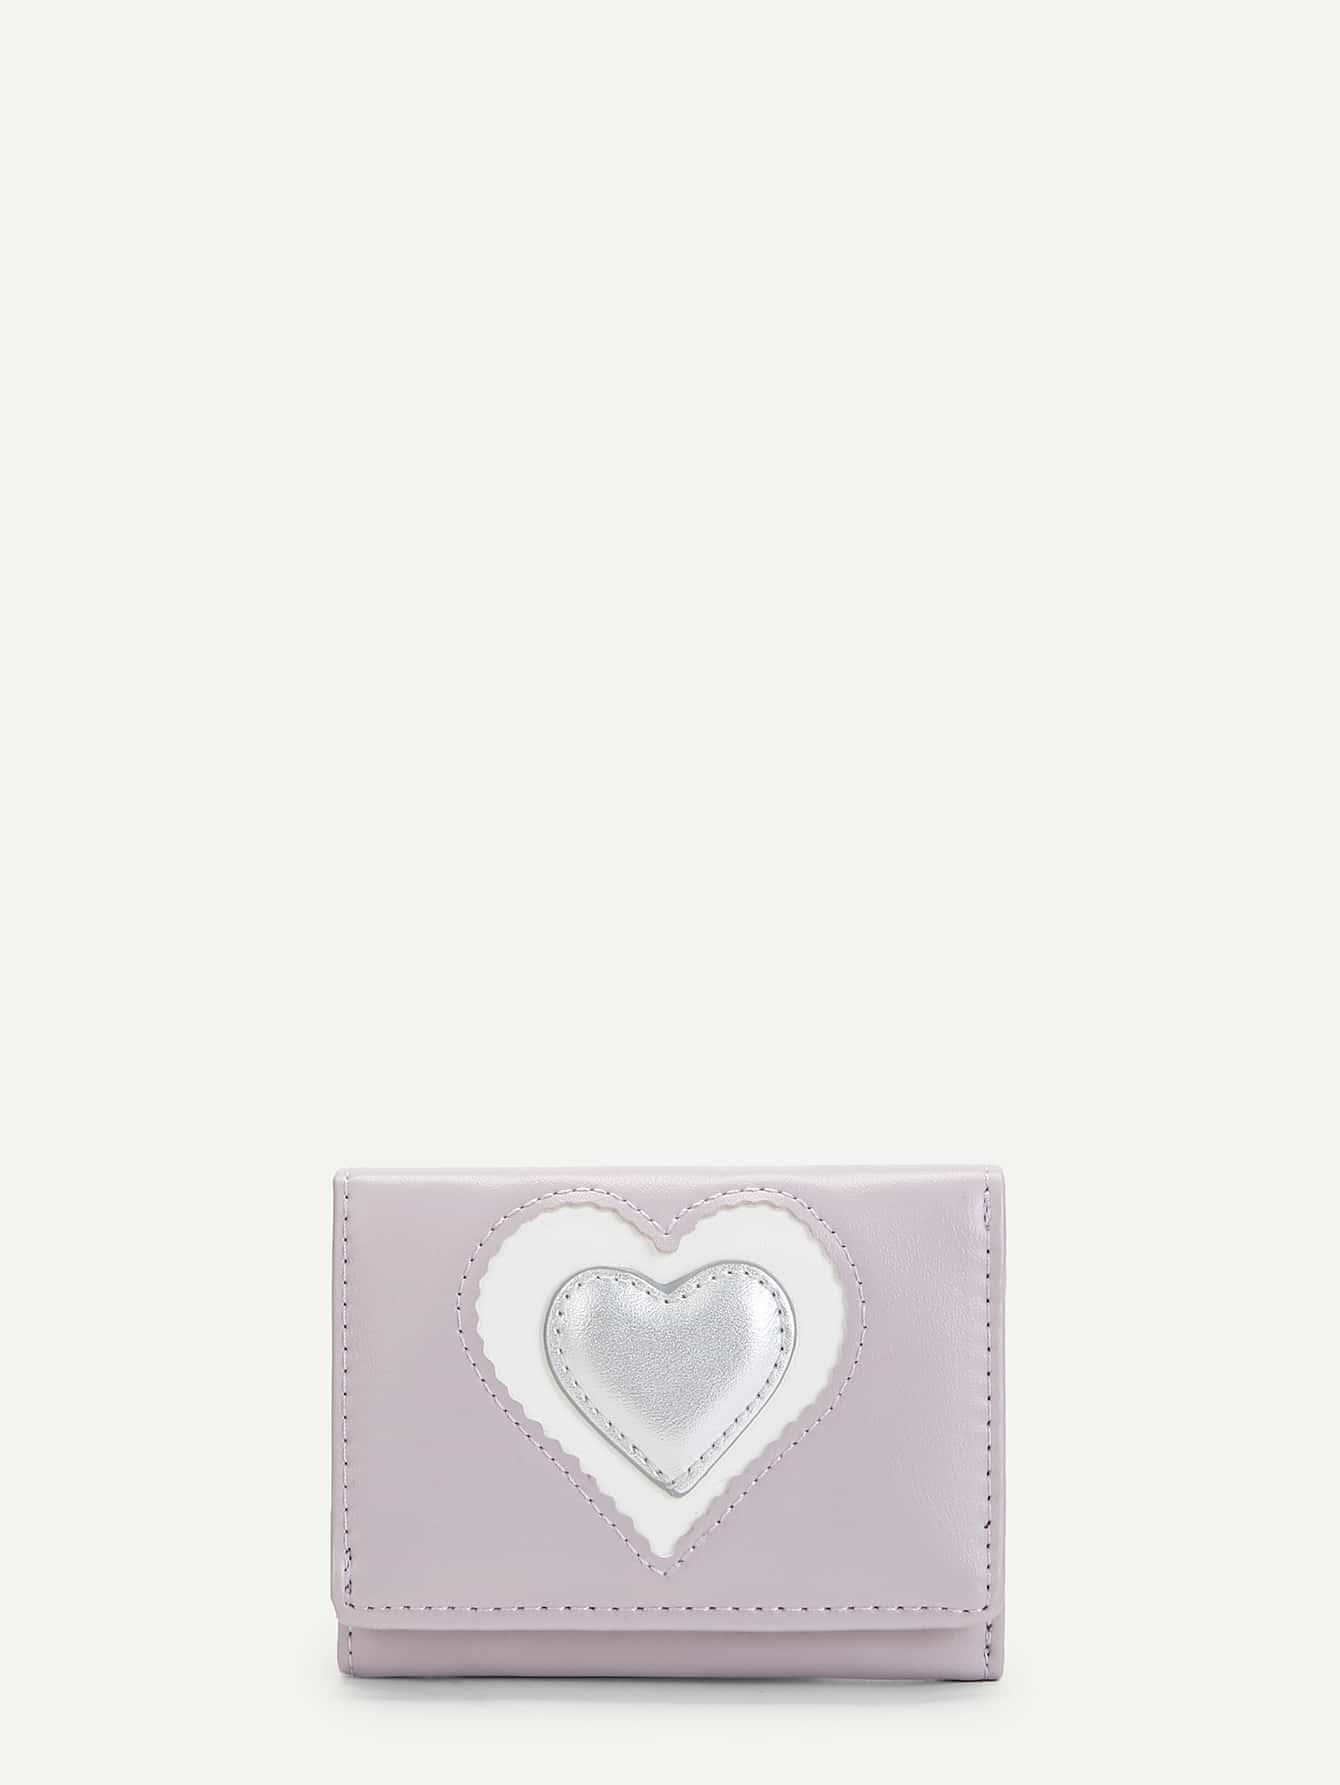 Купить Сердце форма PU кошелек, null, SheIn